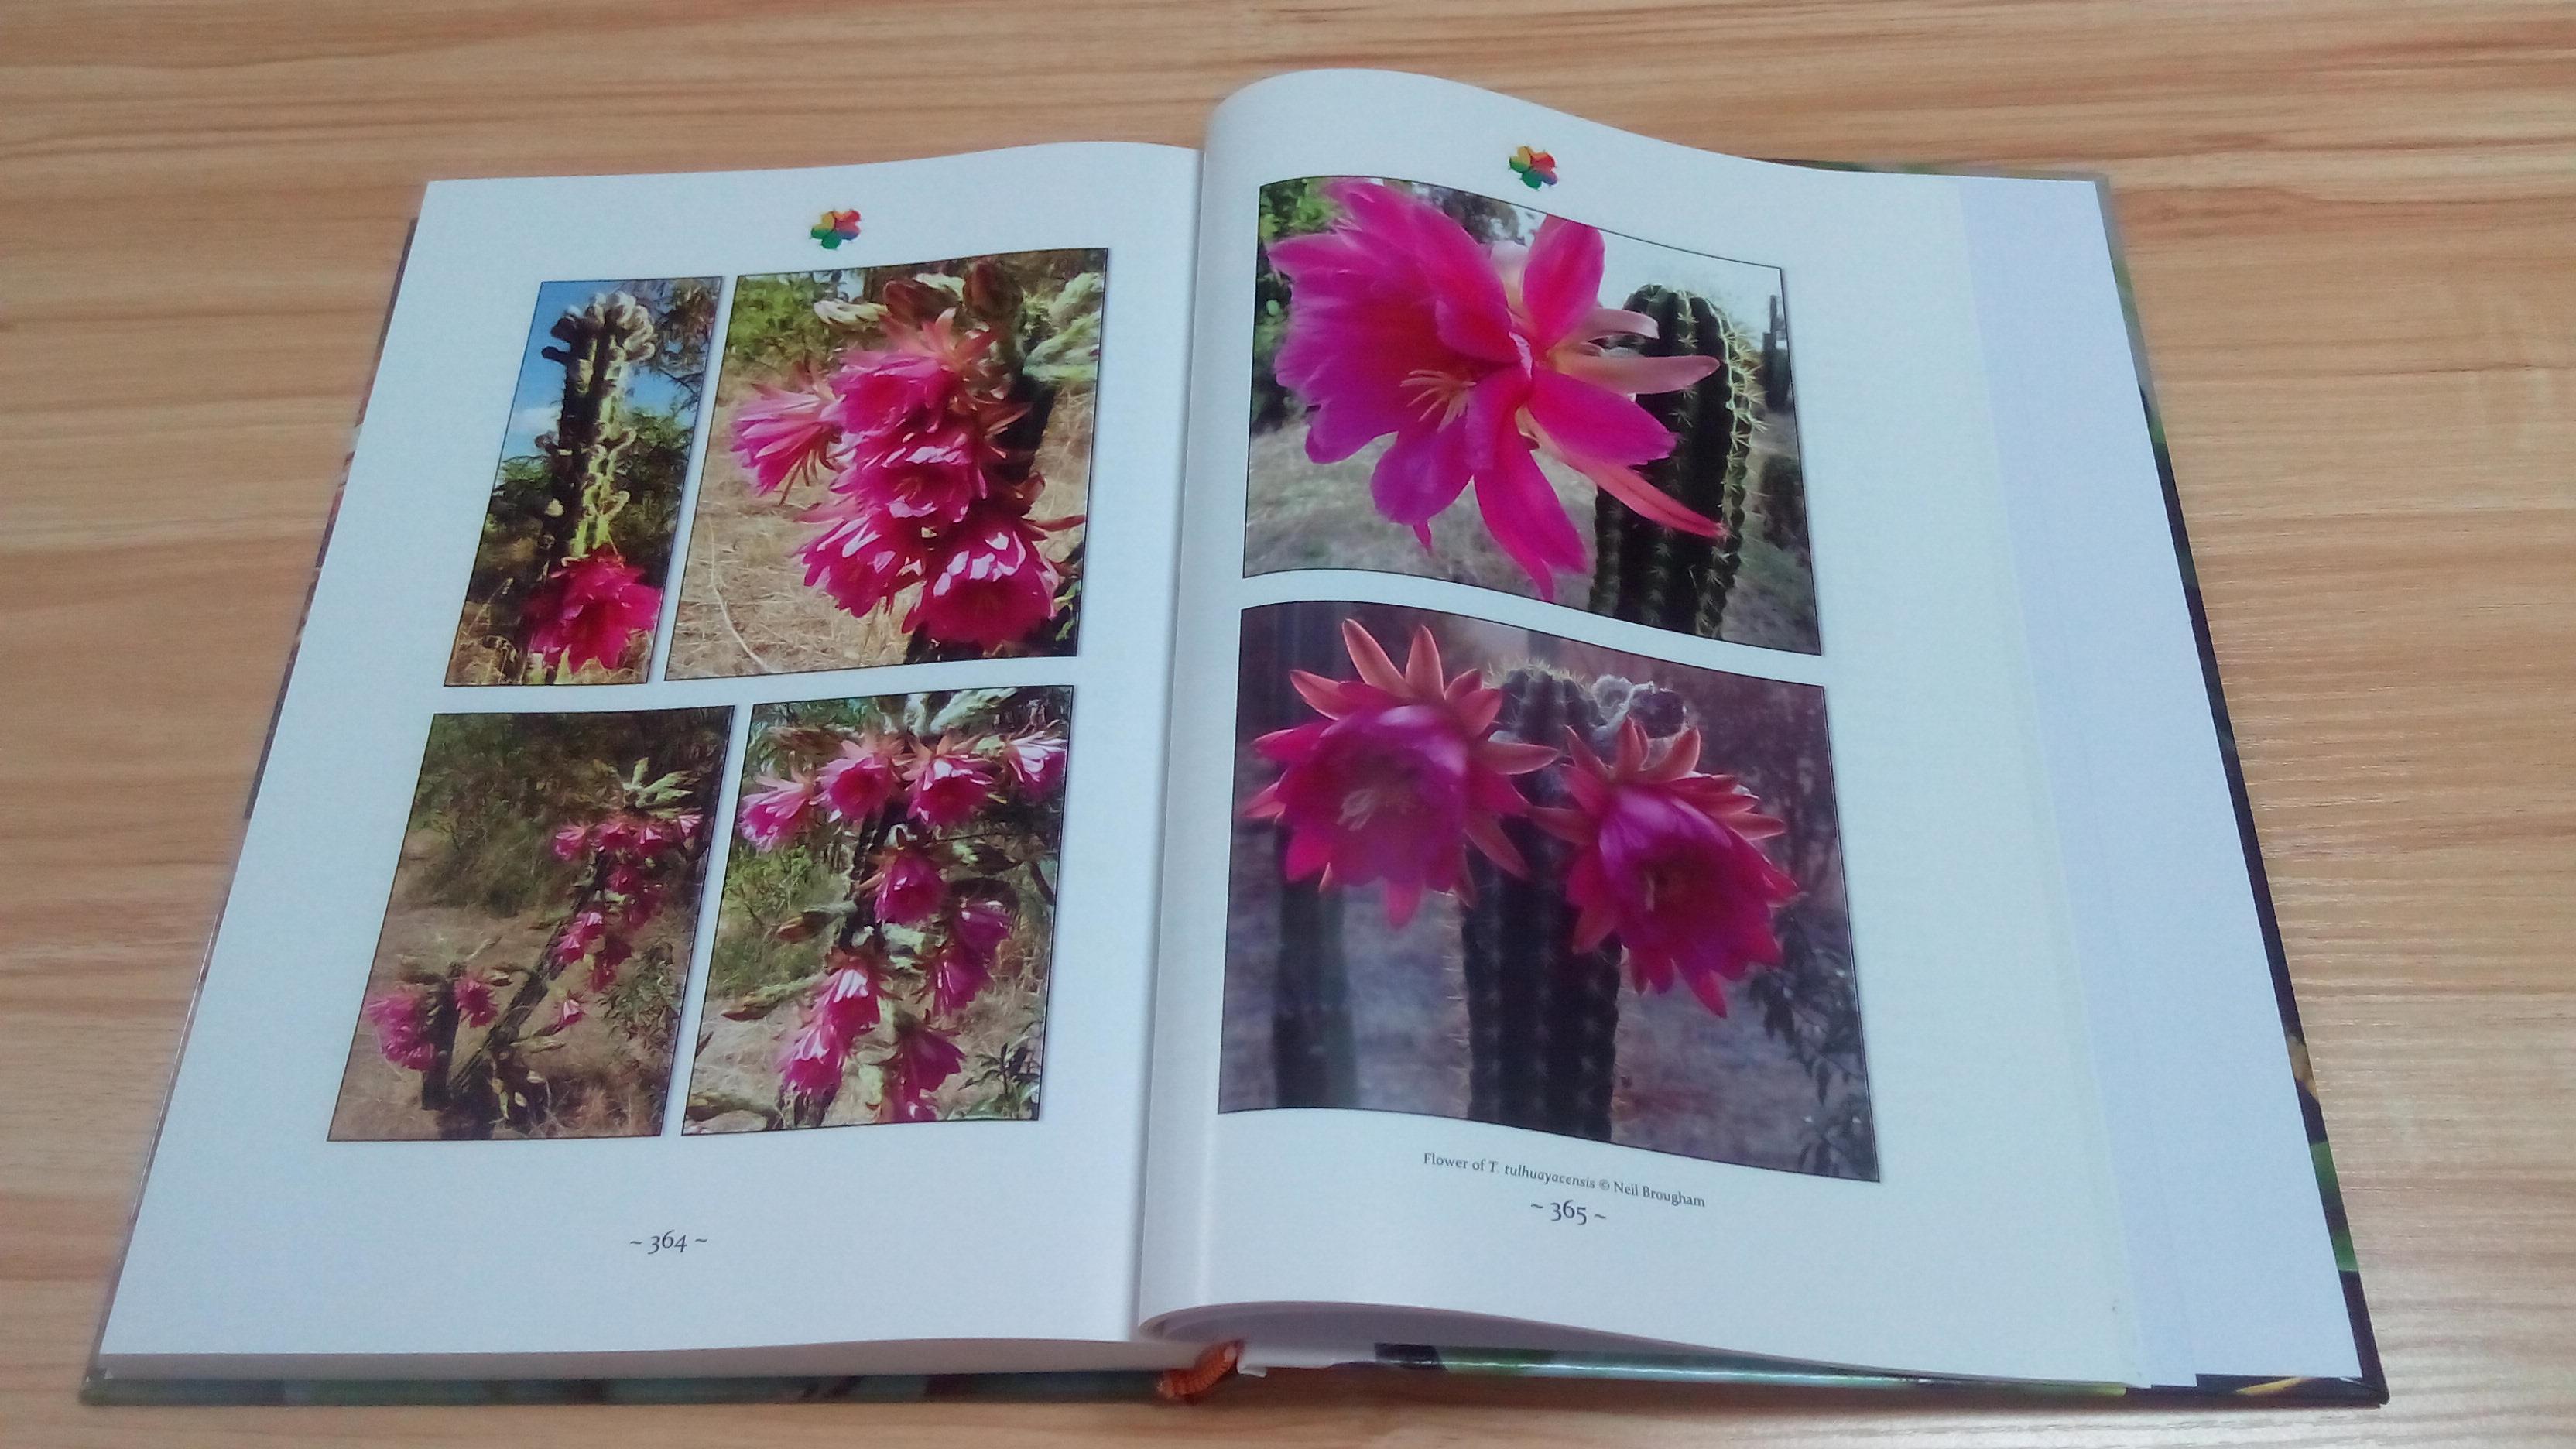 TRICHOCEREUS Book Vol. 1 Patrick Noll Buch Cactus Echinopsis 7